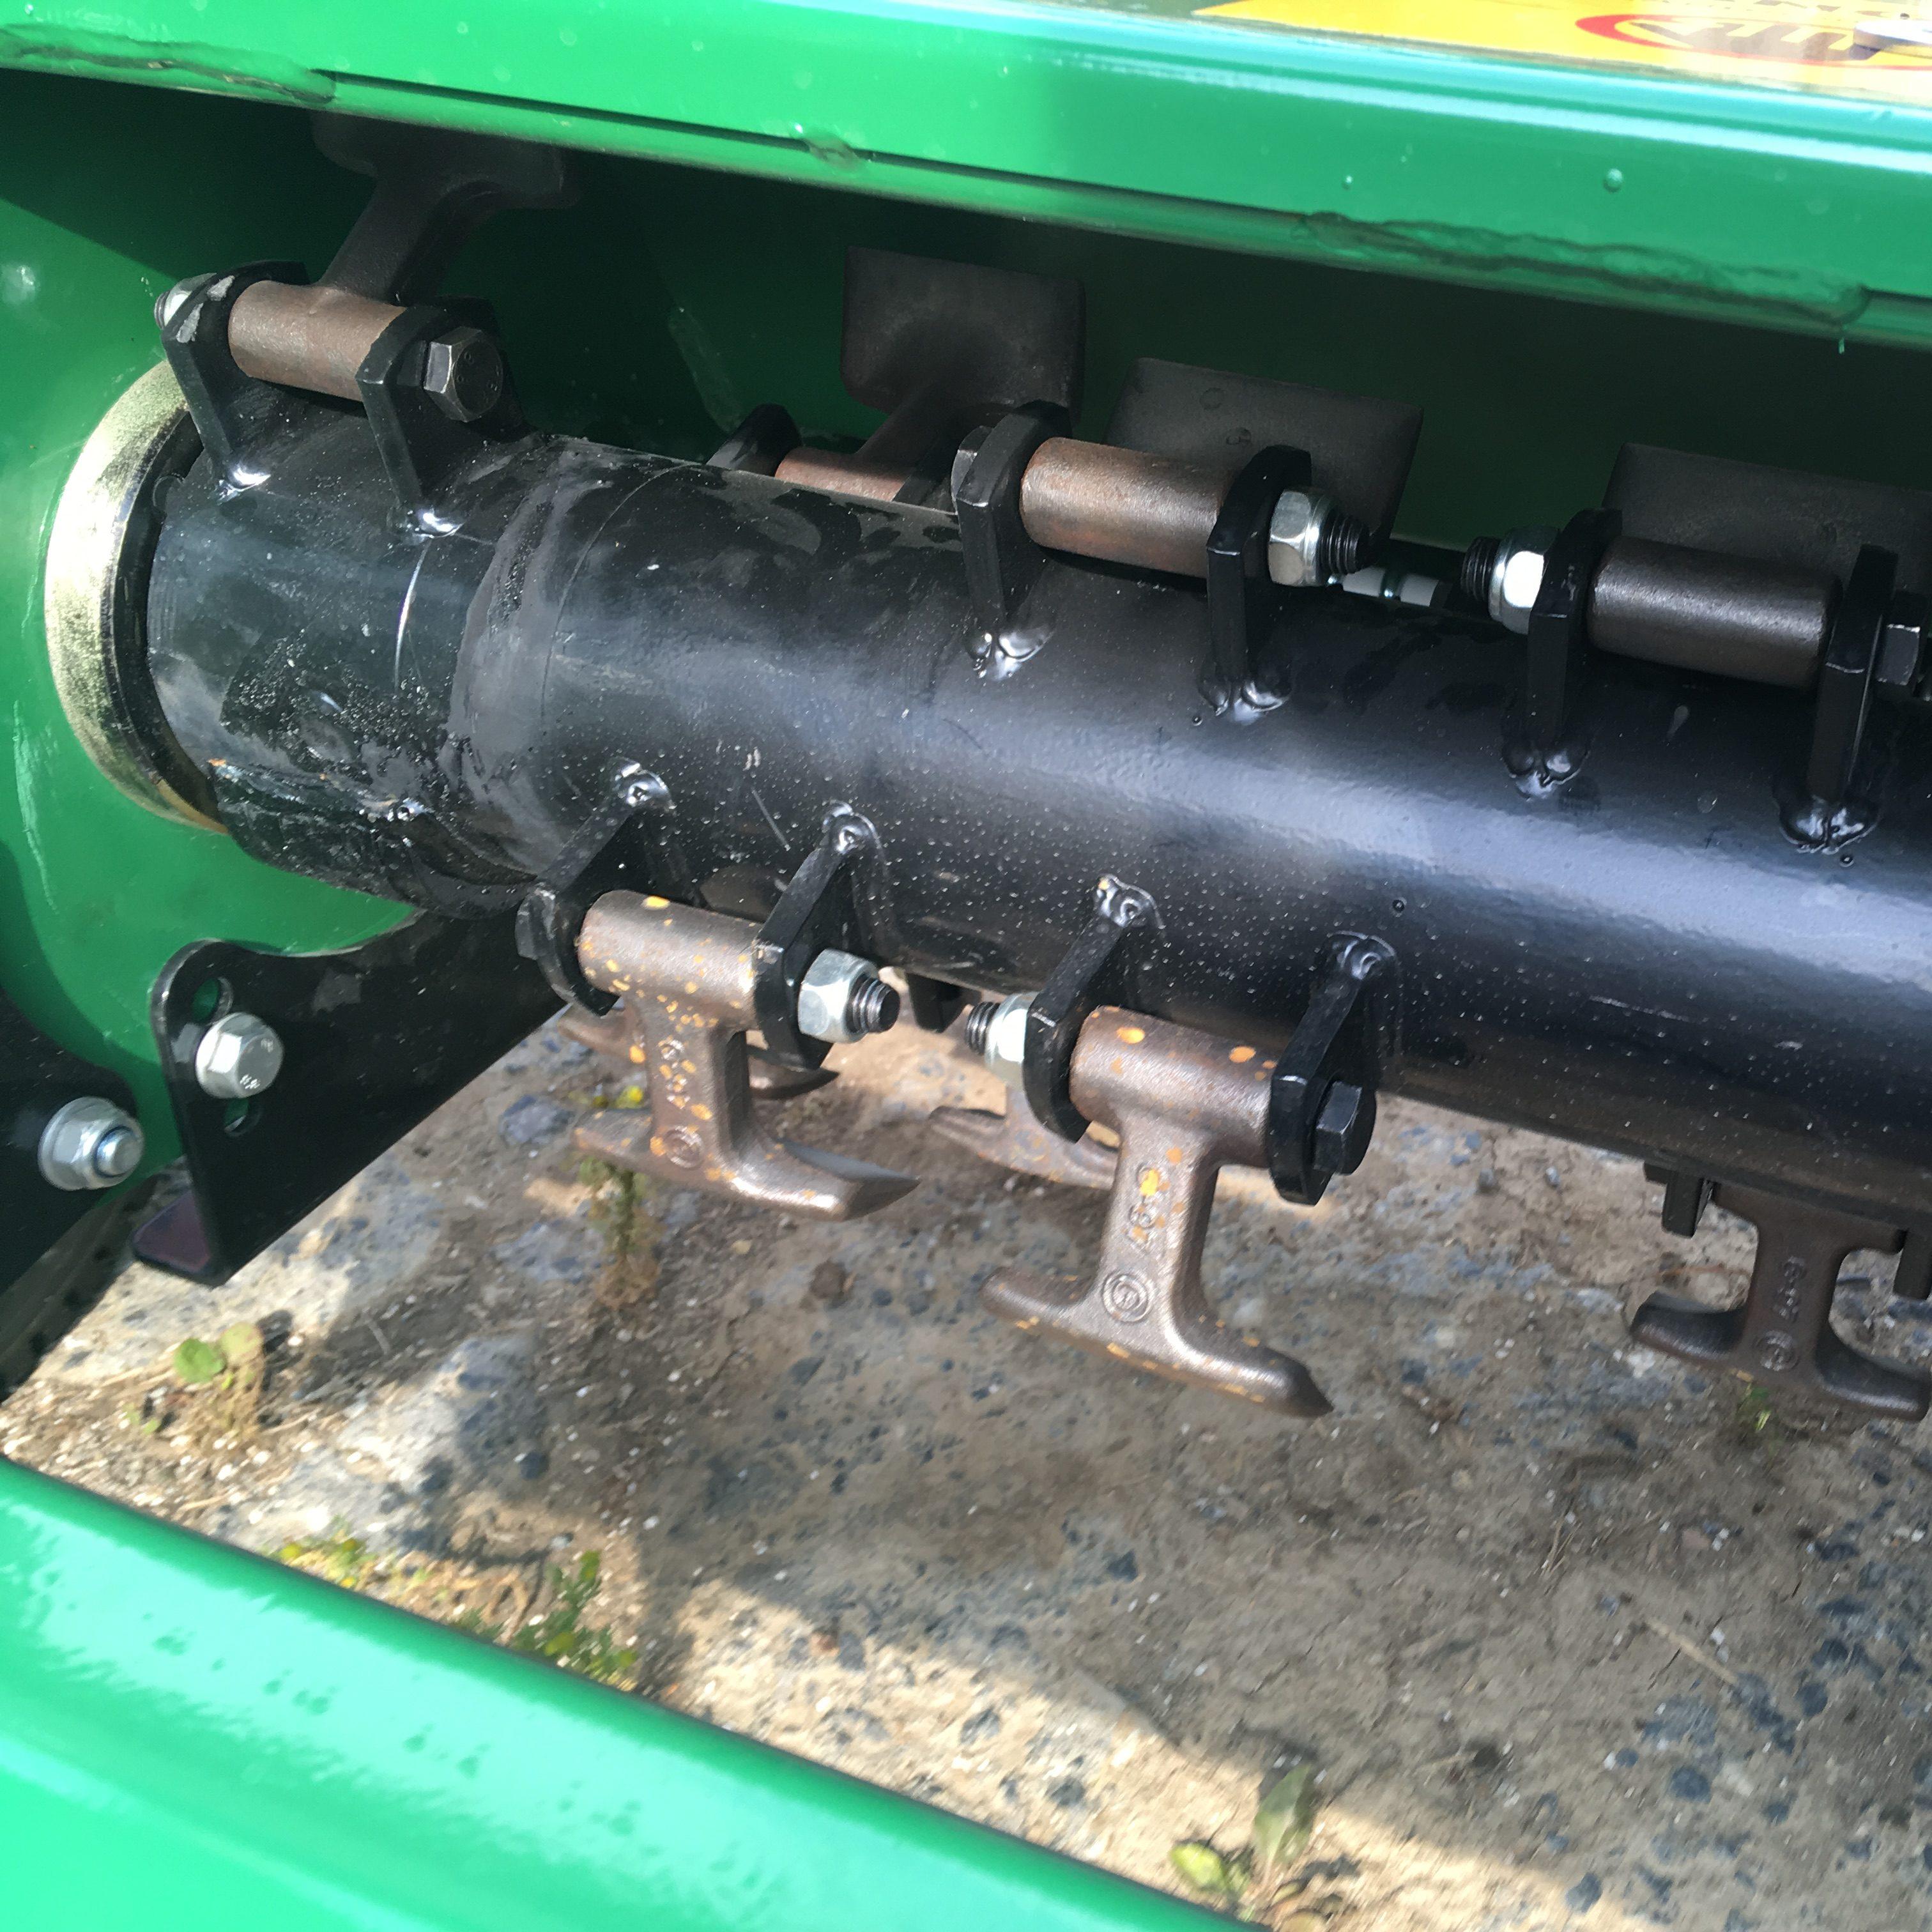 150cm ATV flail mower | Davies Implements